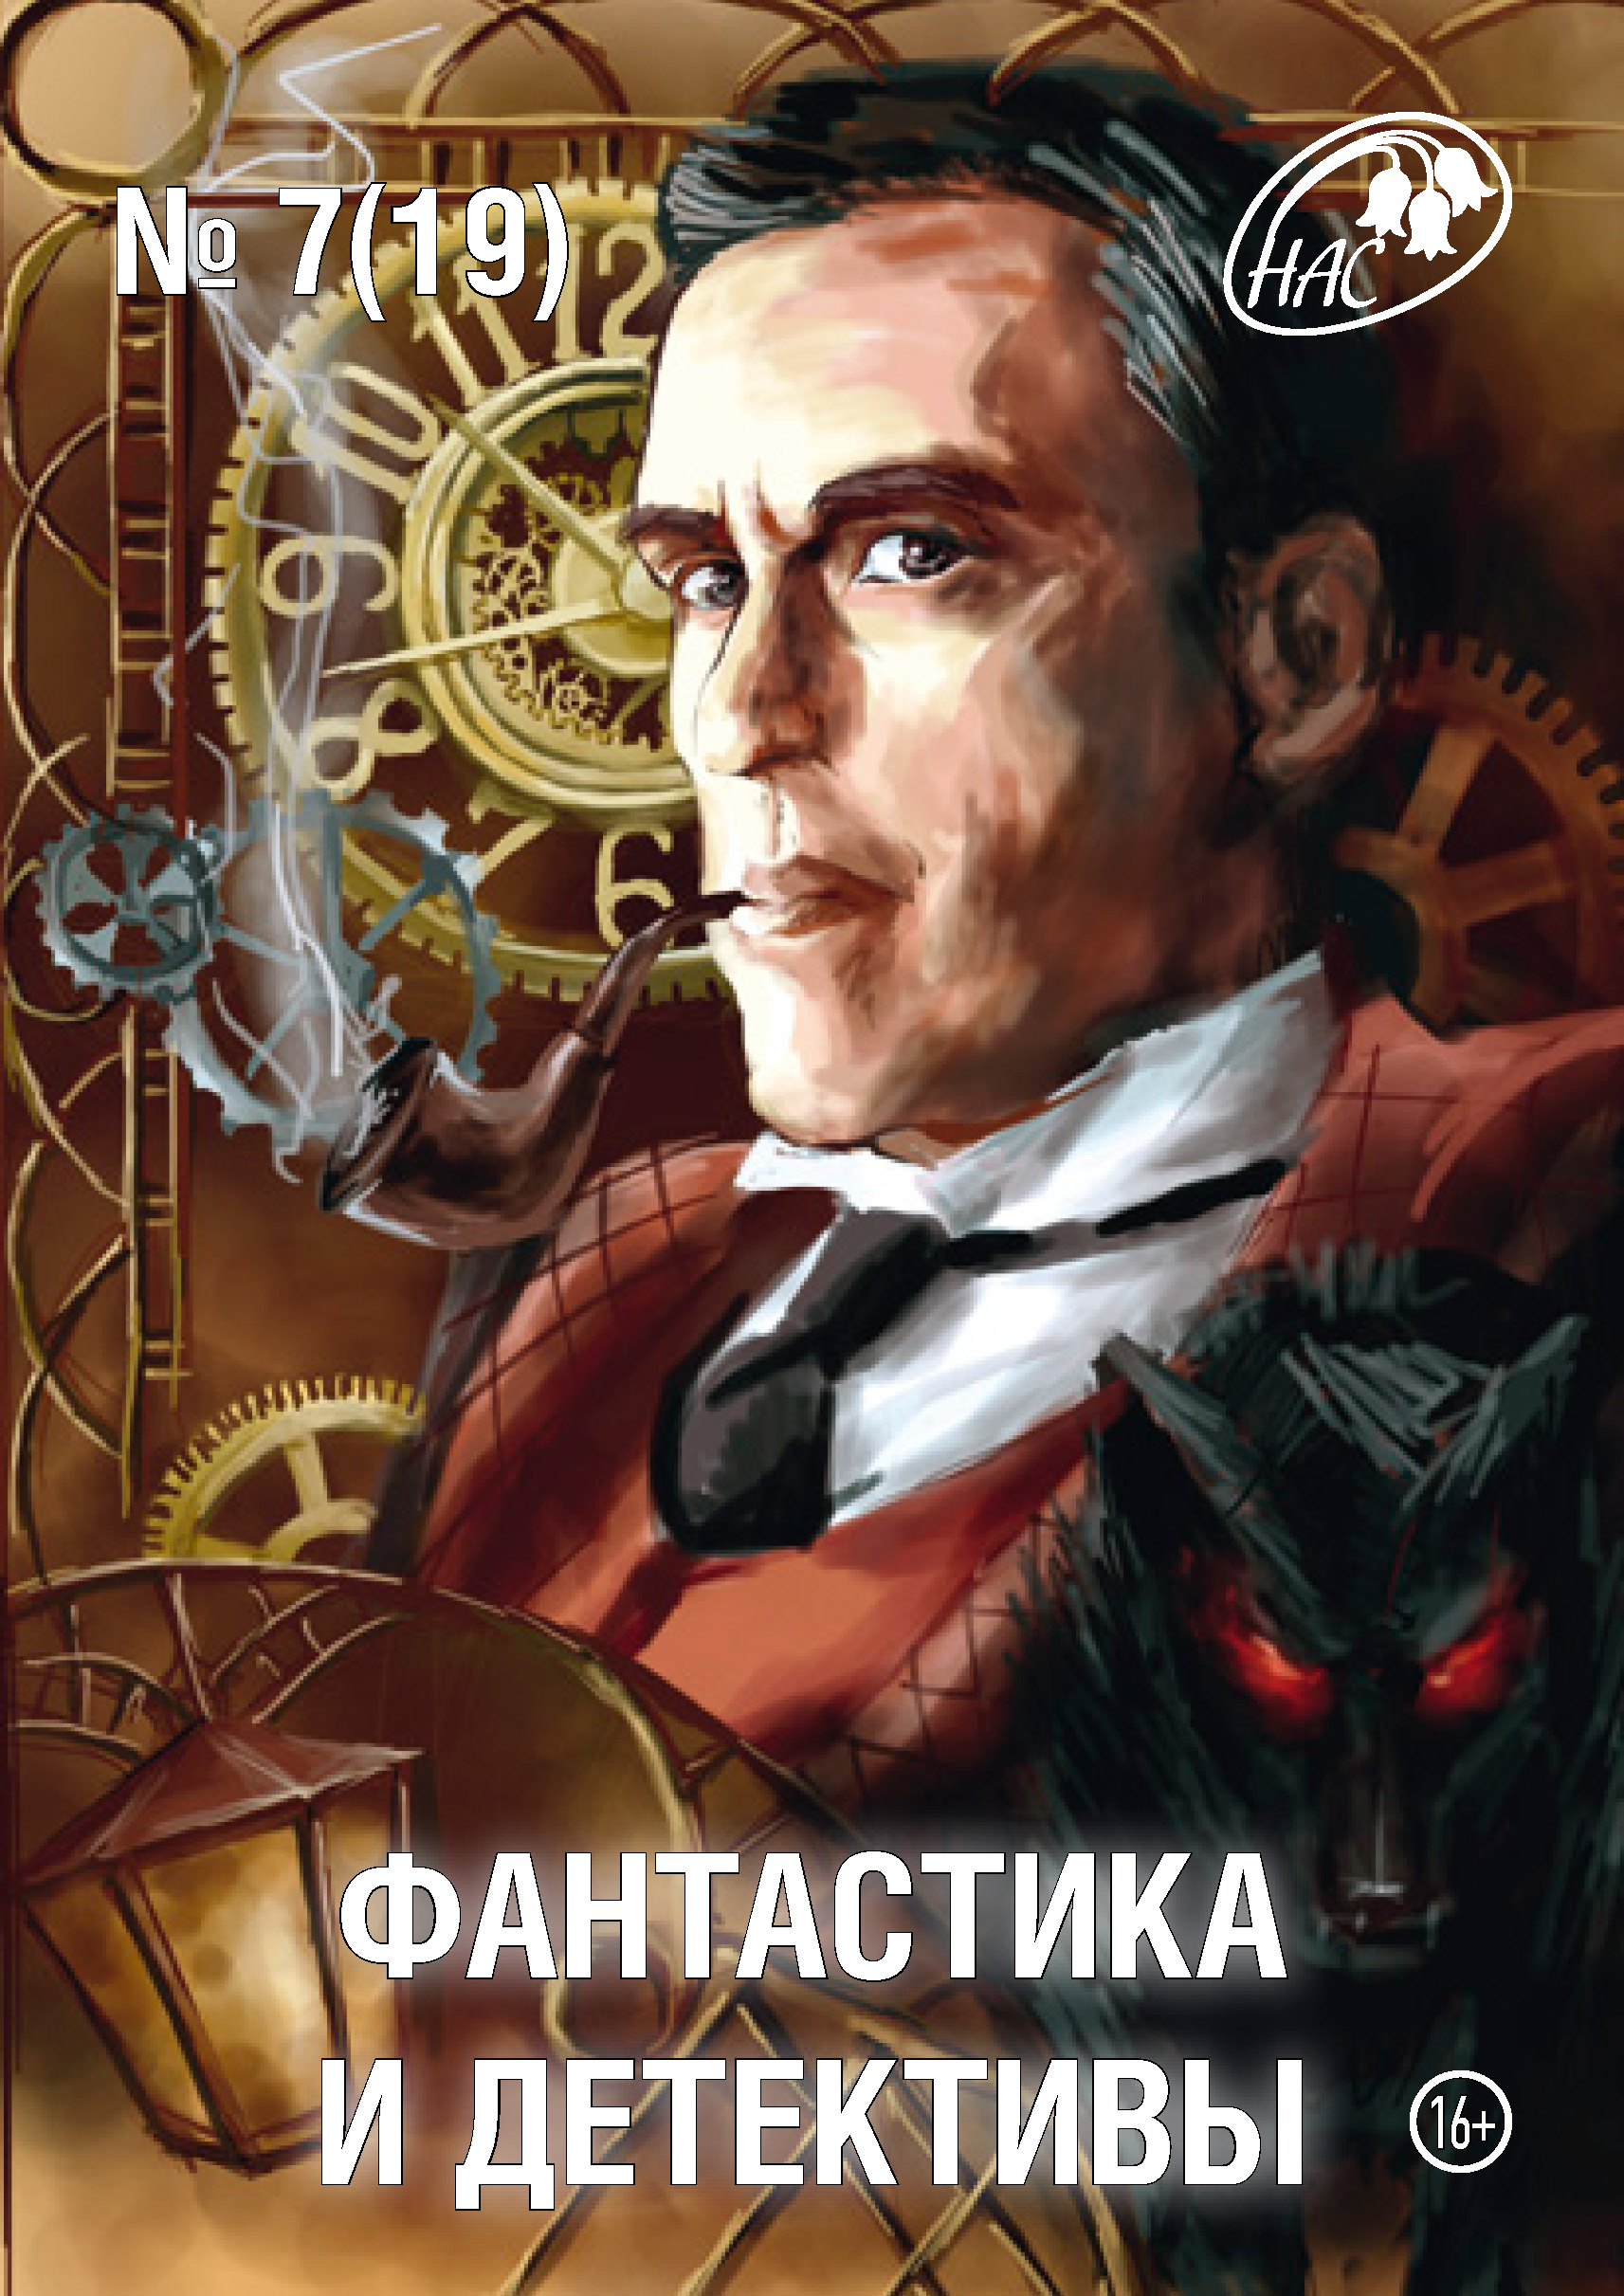 Сборник Журнал «Фантастика и Детективы» №7 (19) 2014